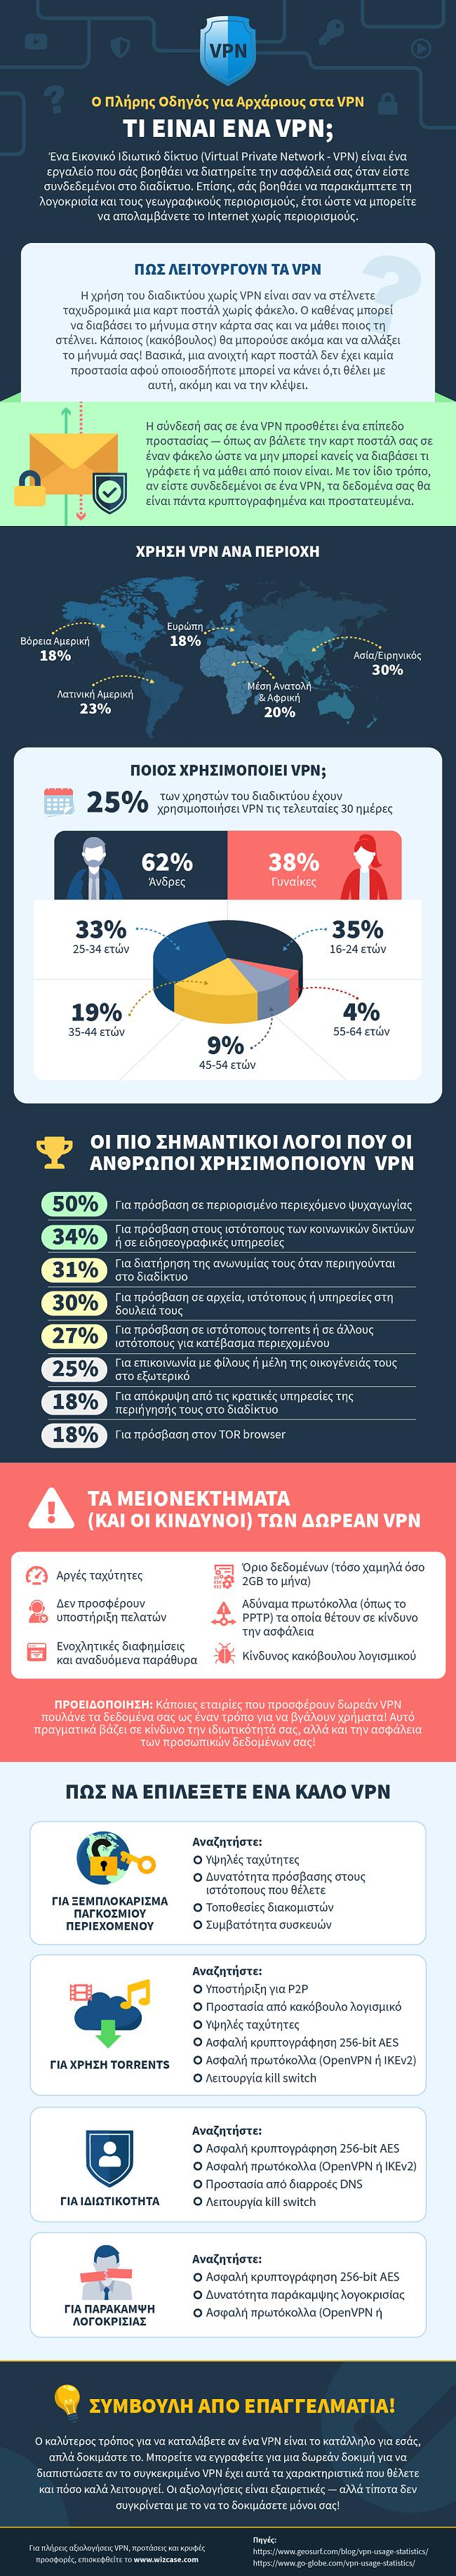 infographic σχετικά με το τι είναι vpn